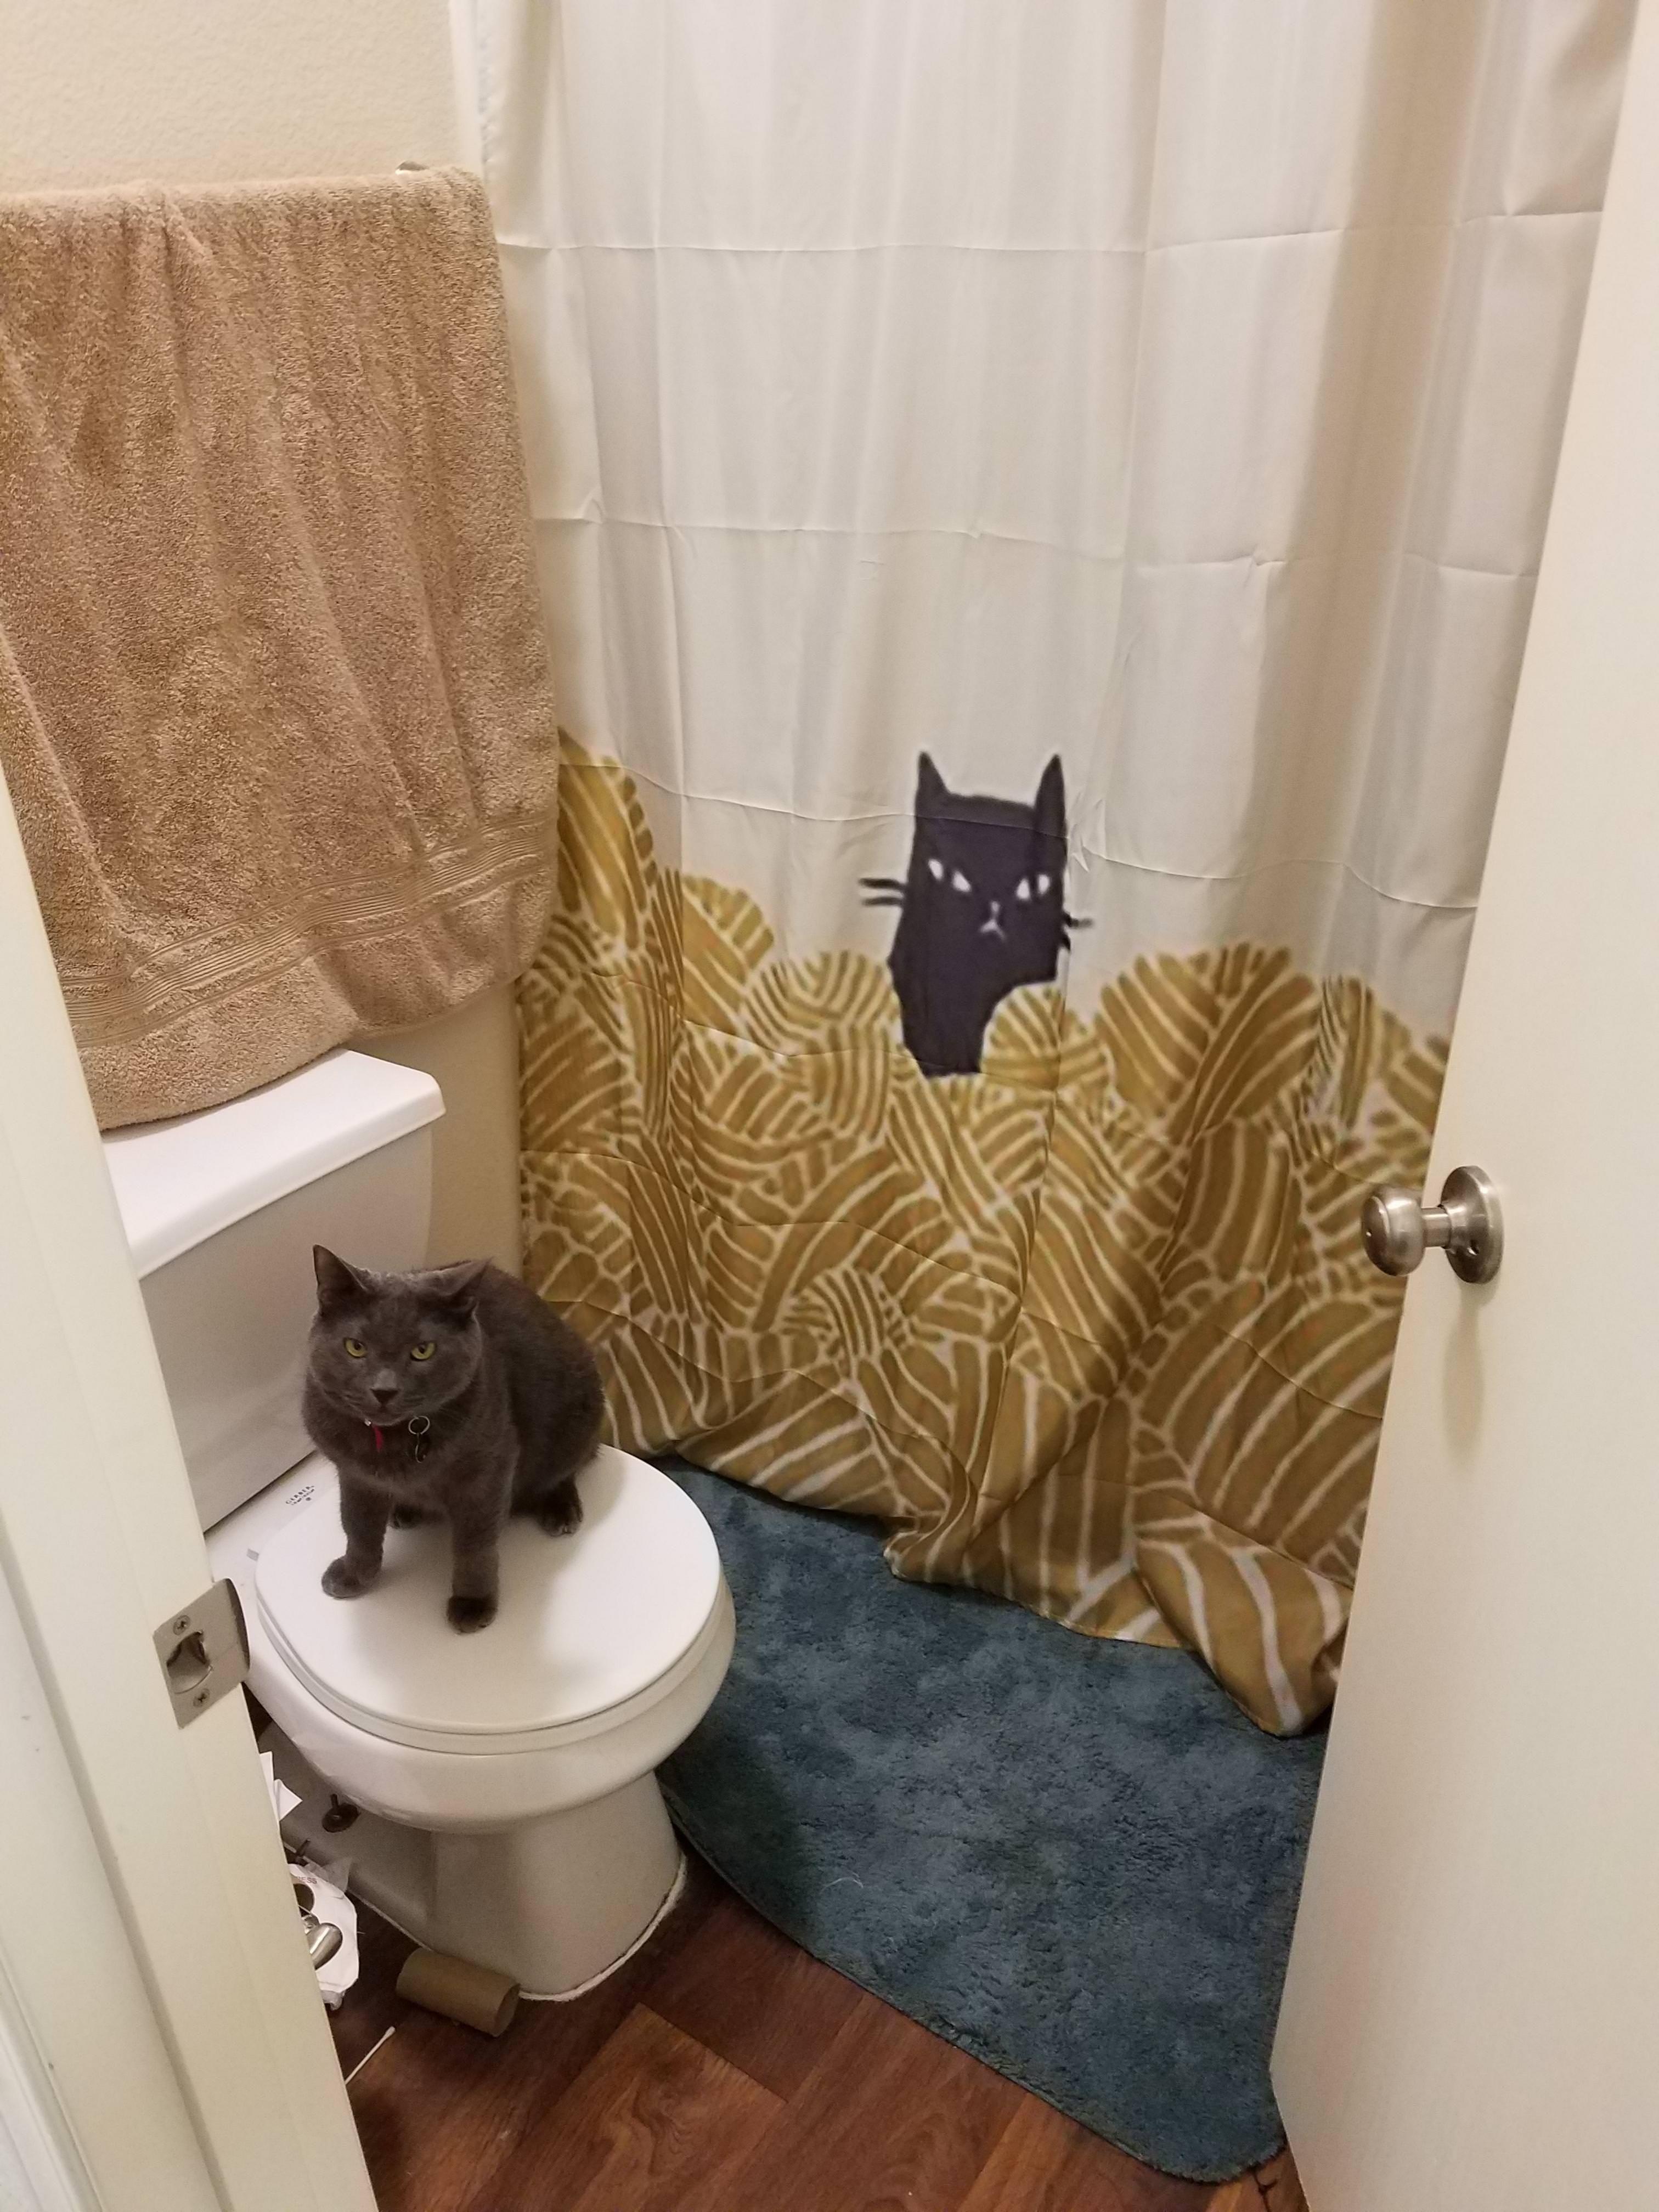 Spongebob Meme Shower Curtain